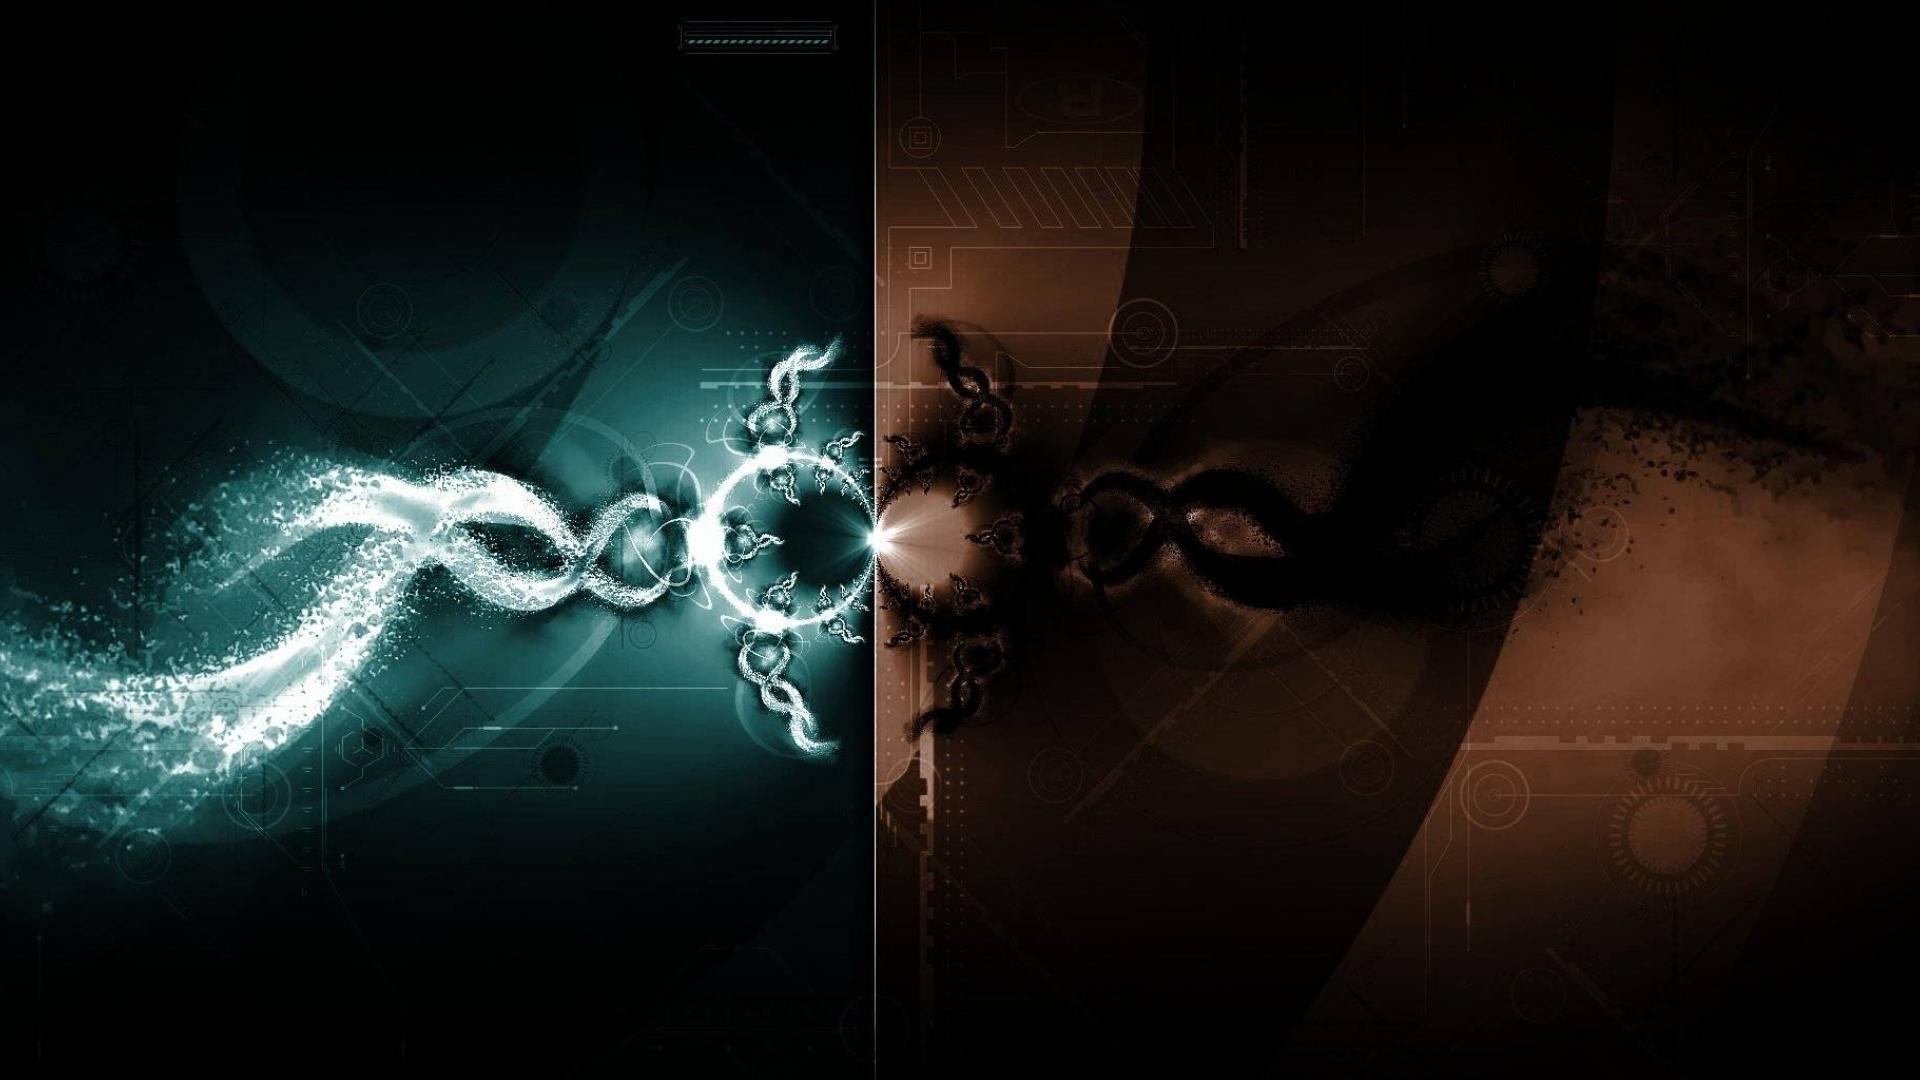 Cool Dual Screen Wallpaper 59 Images